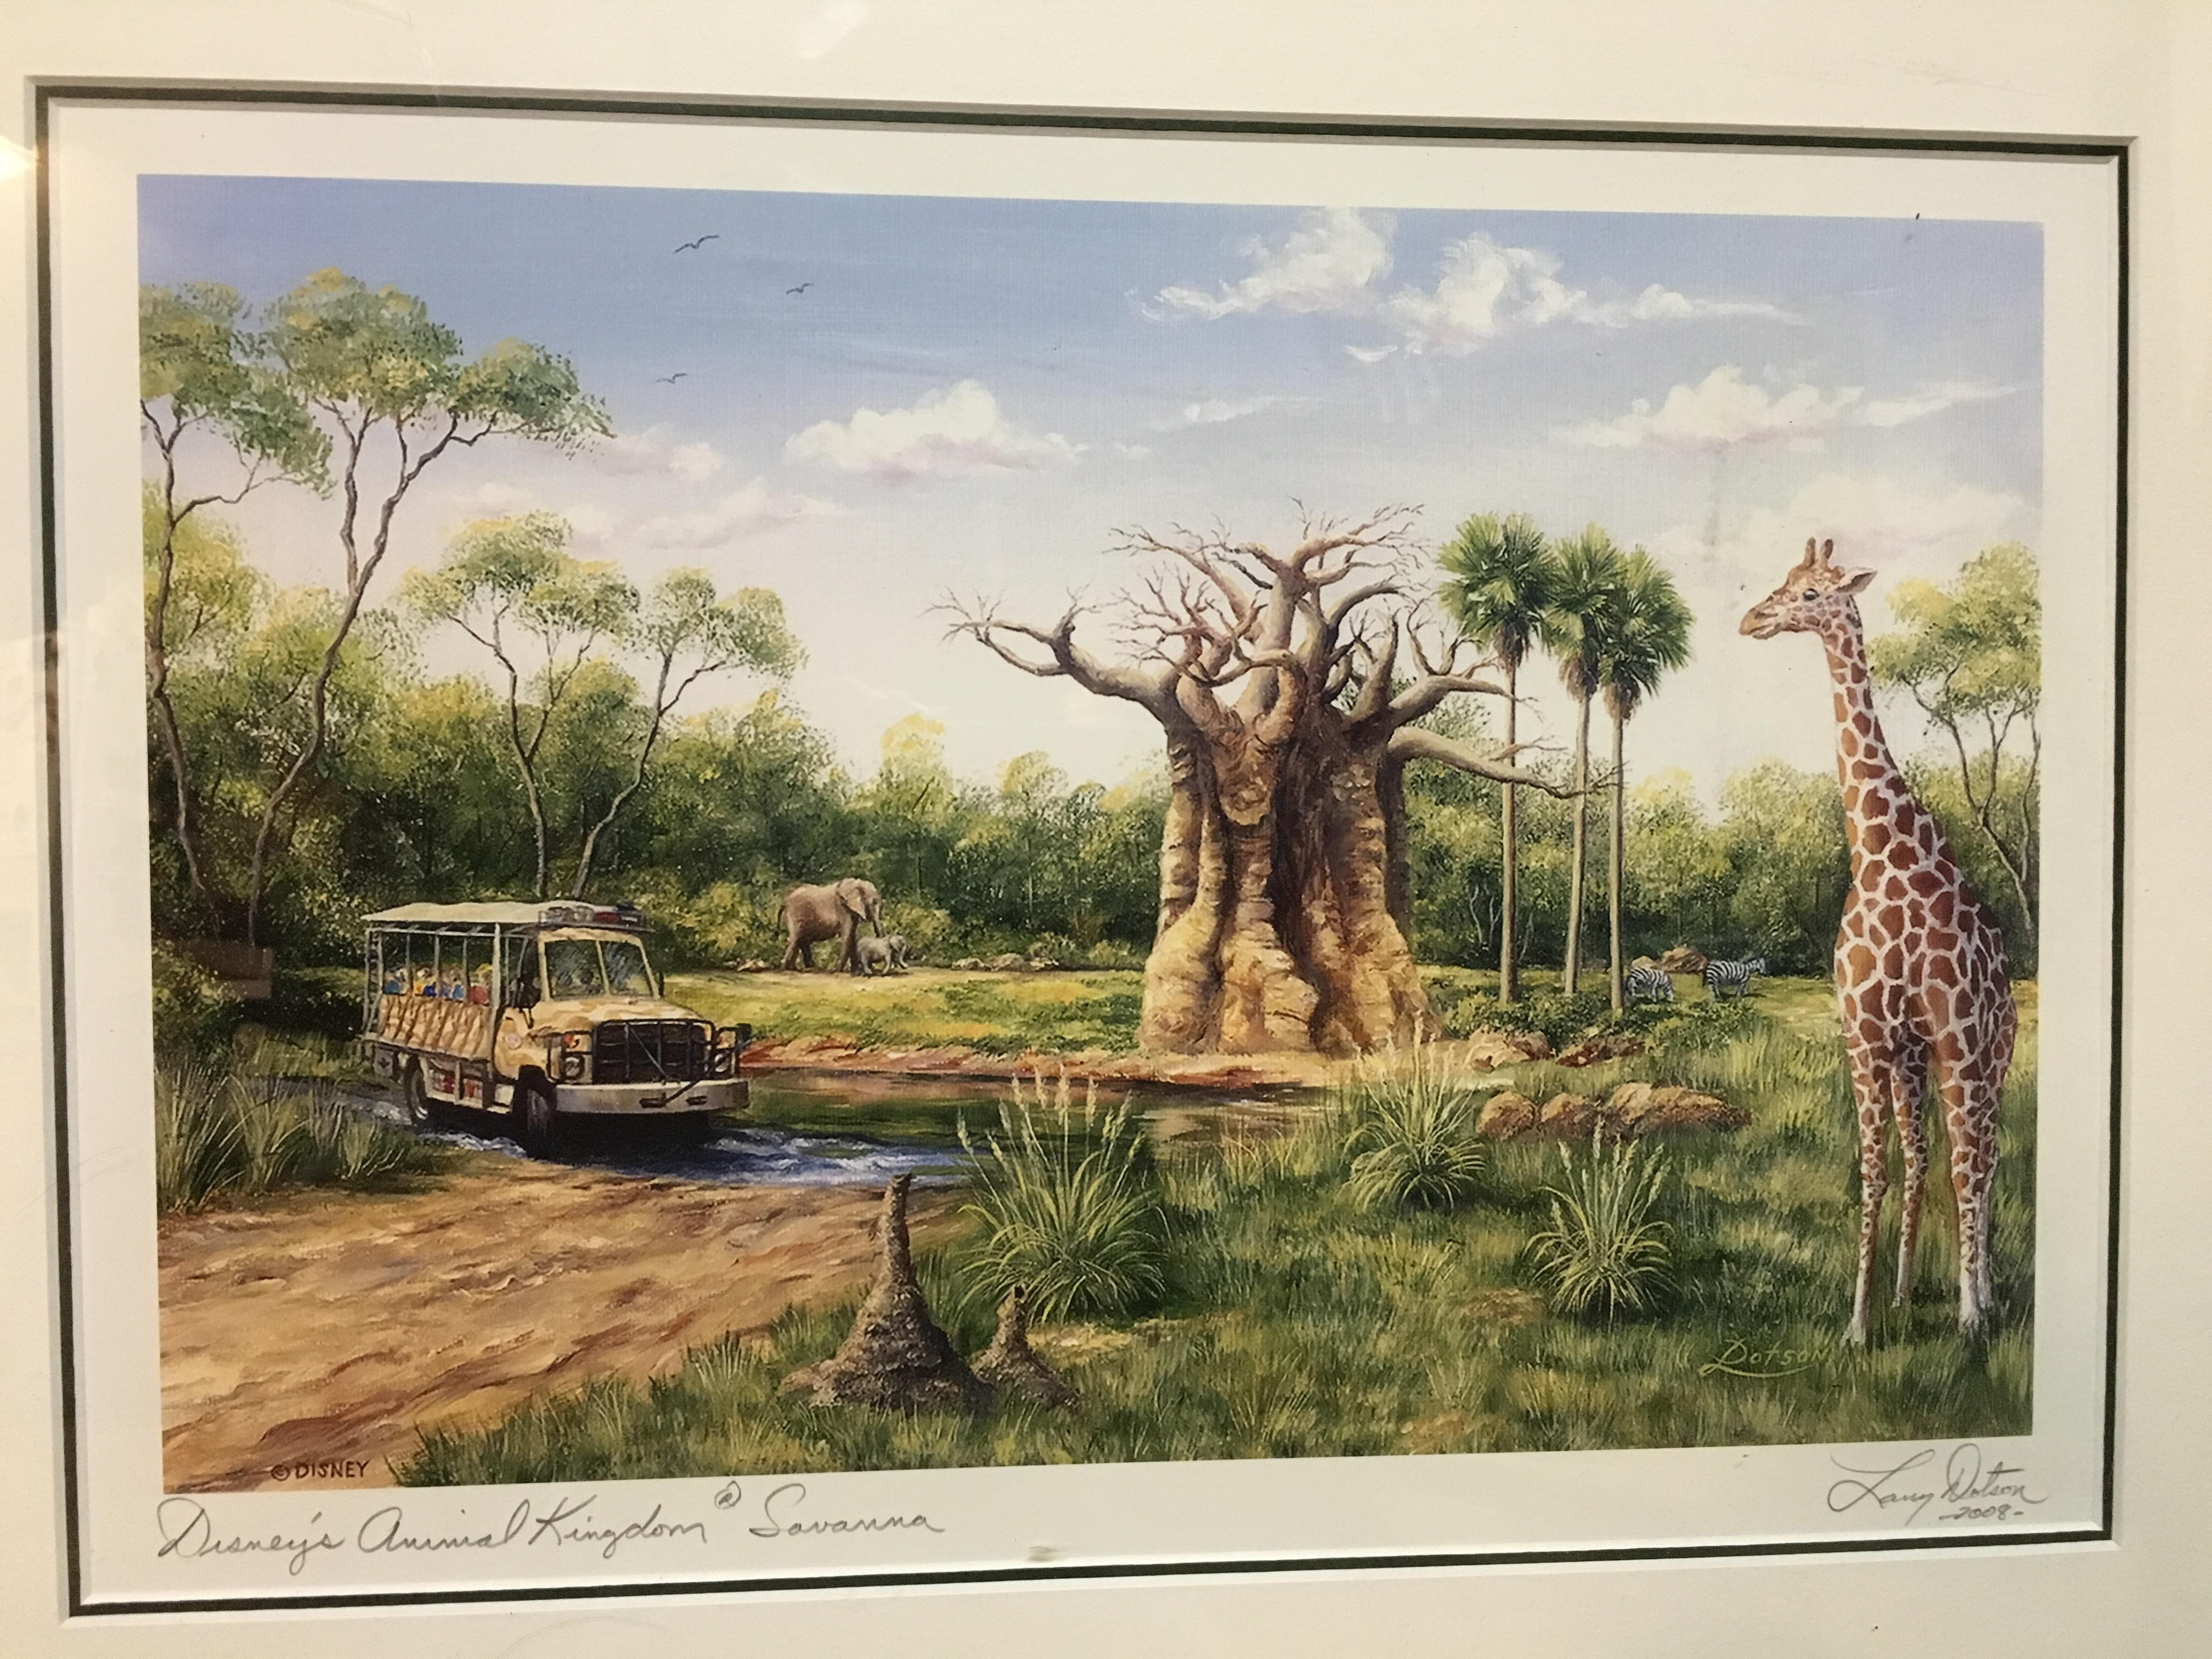 20 Disney's Animal Kingdom at Savanna portrait by Larry Dotson ...